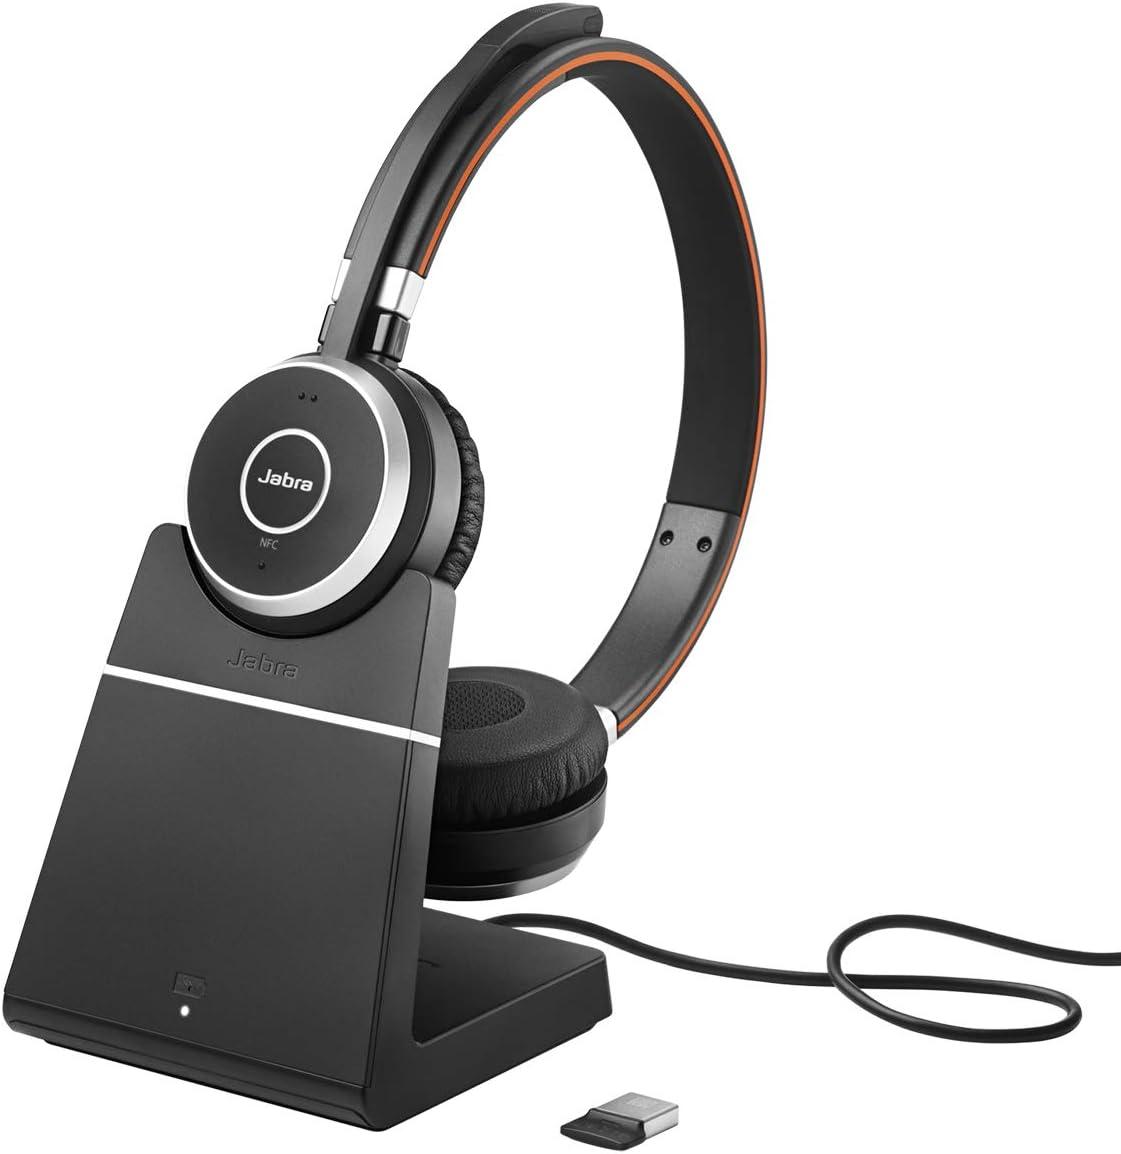 Jabra Evolve 65 Wireless Stereo On Ear Headset Microsoft Teams Zertifizierte Kopfhörer Mit Langer Akkulaufzeit Und Ladestation Usb Bluetooth Adapter Schwarz Elektronik